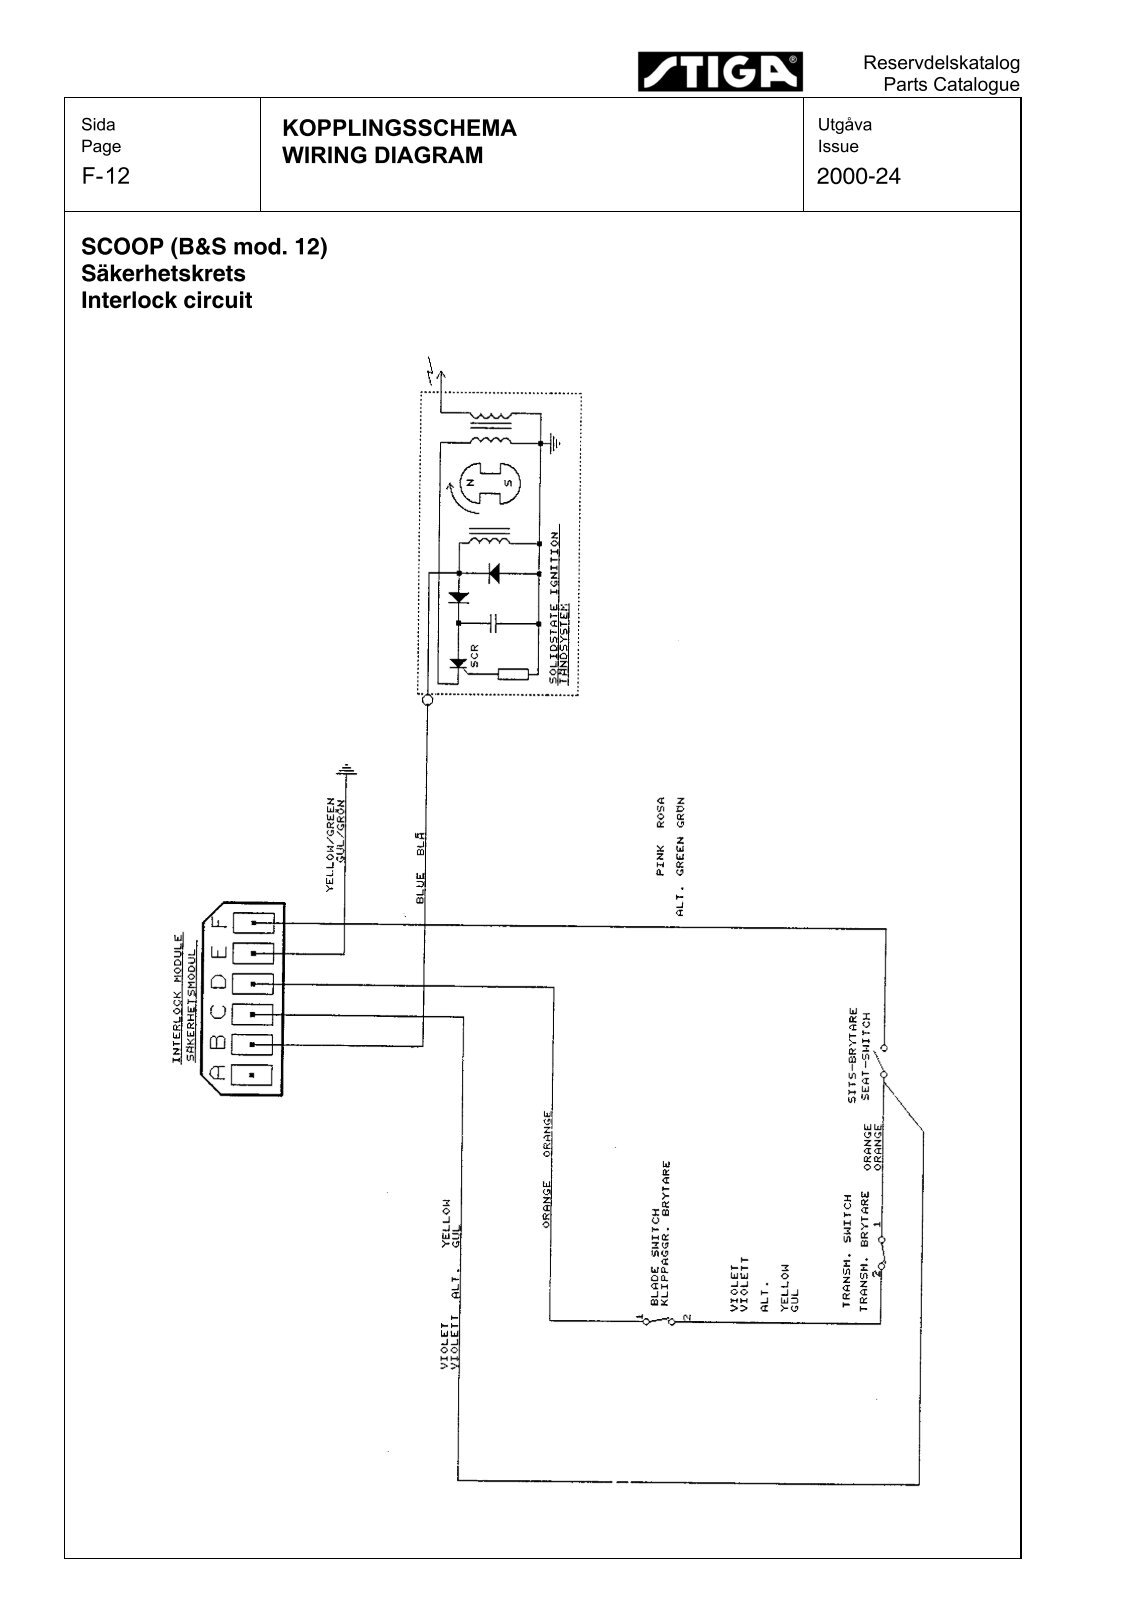 m1008 wiring diagram wiring schematics diagram rh wiring regdiy co 1984 cucv m1009 light diagram cucv alternator wiring [ 1140 x 1614 Pixel ]